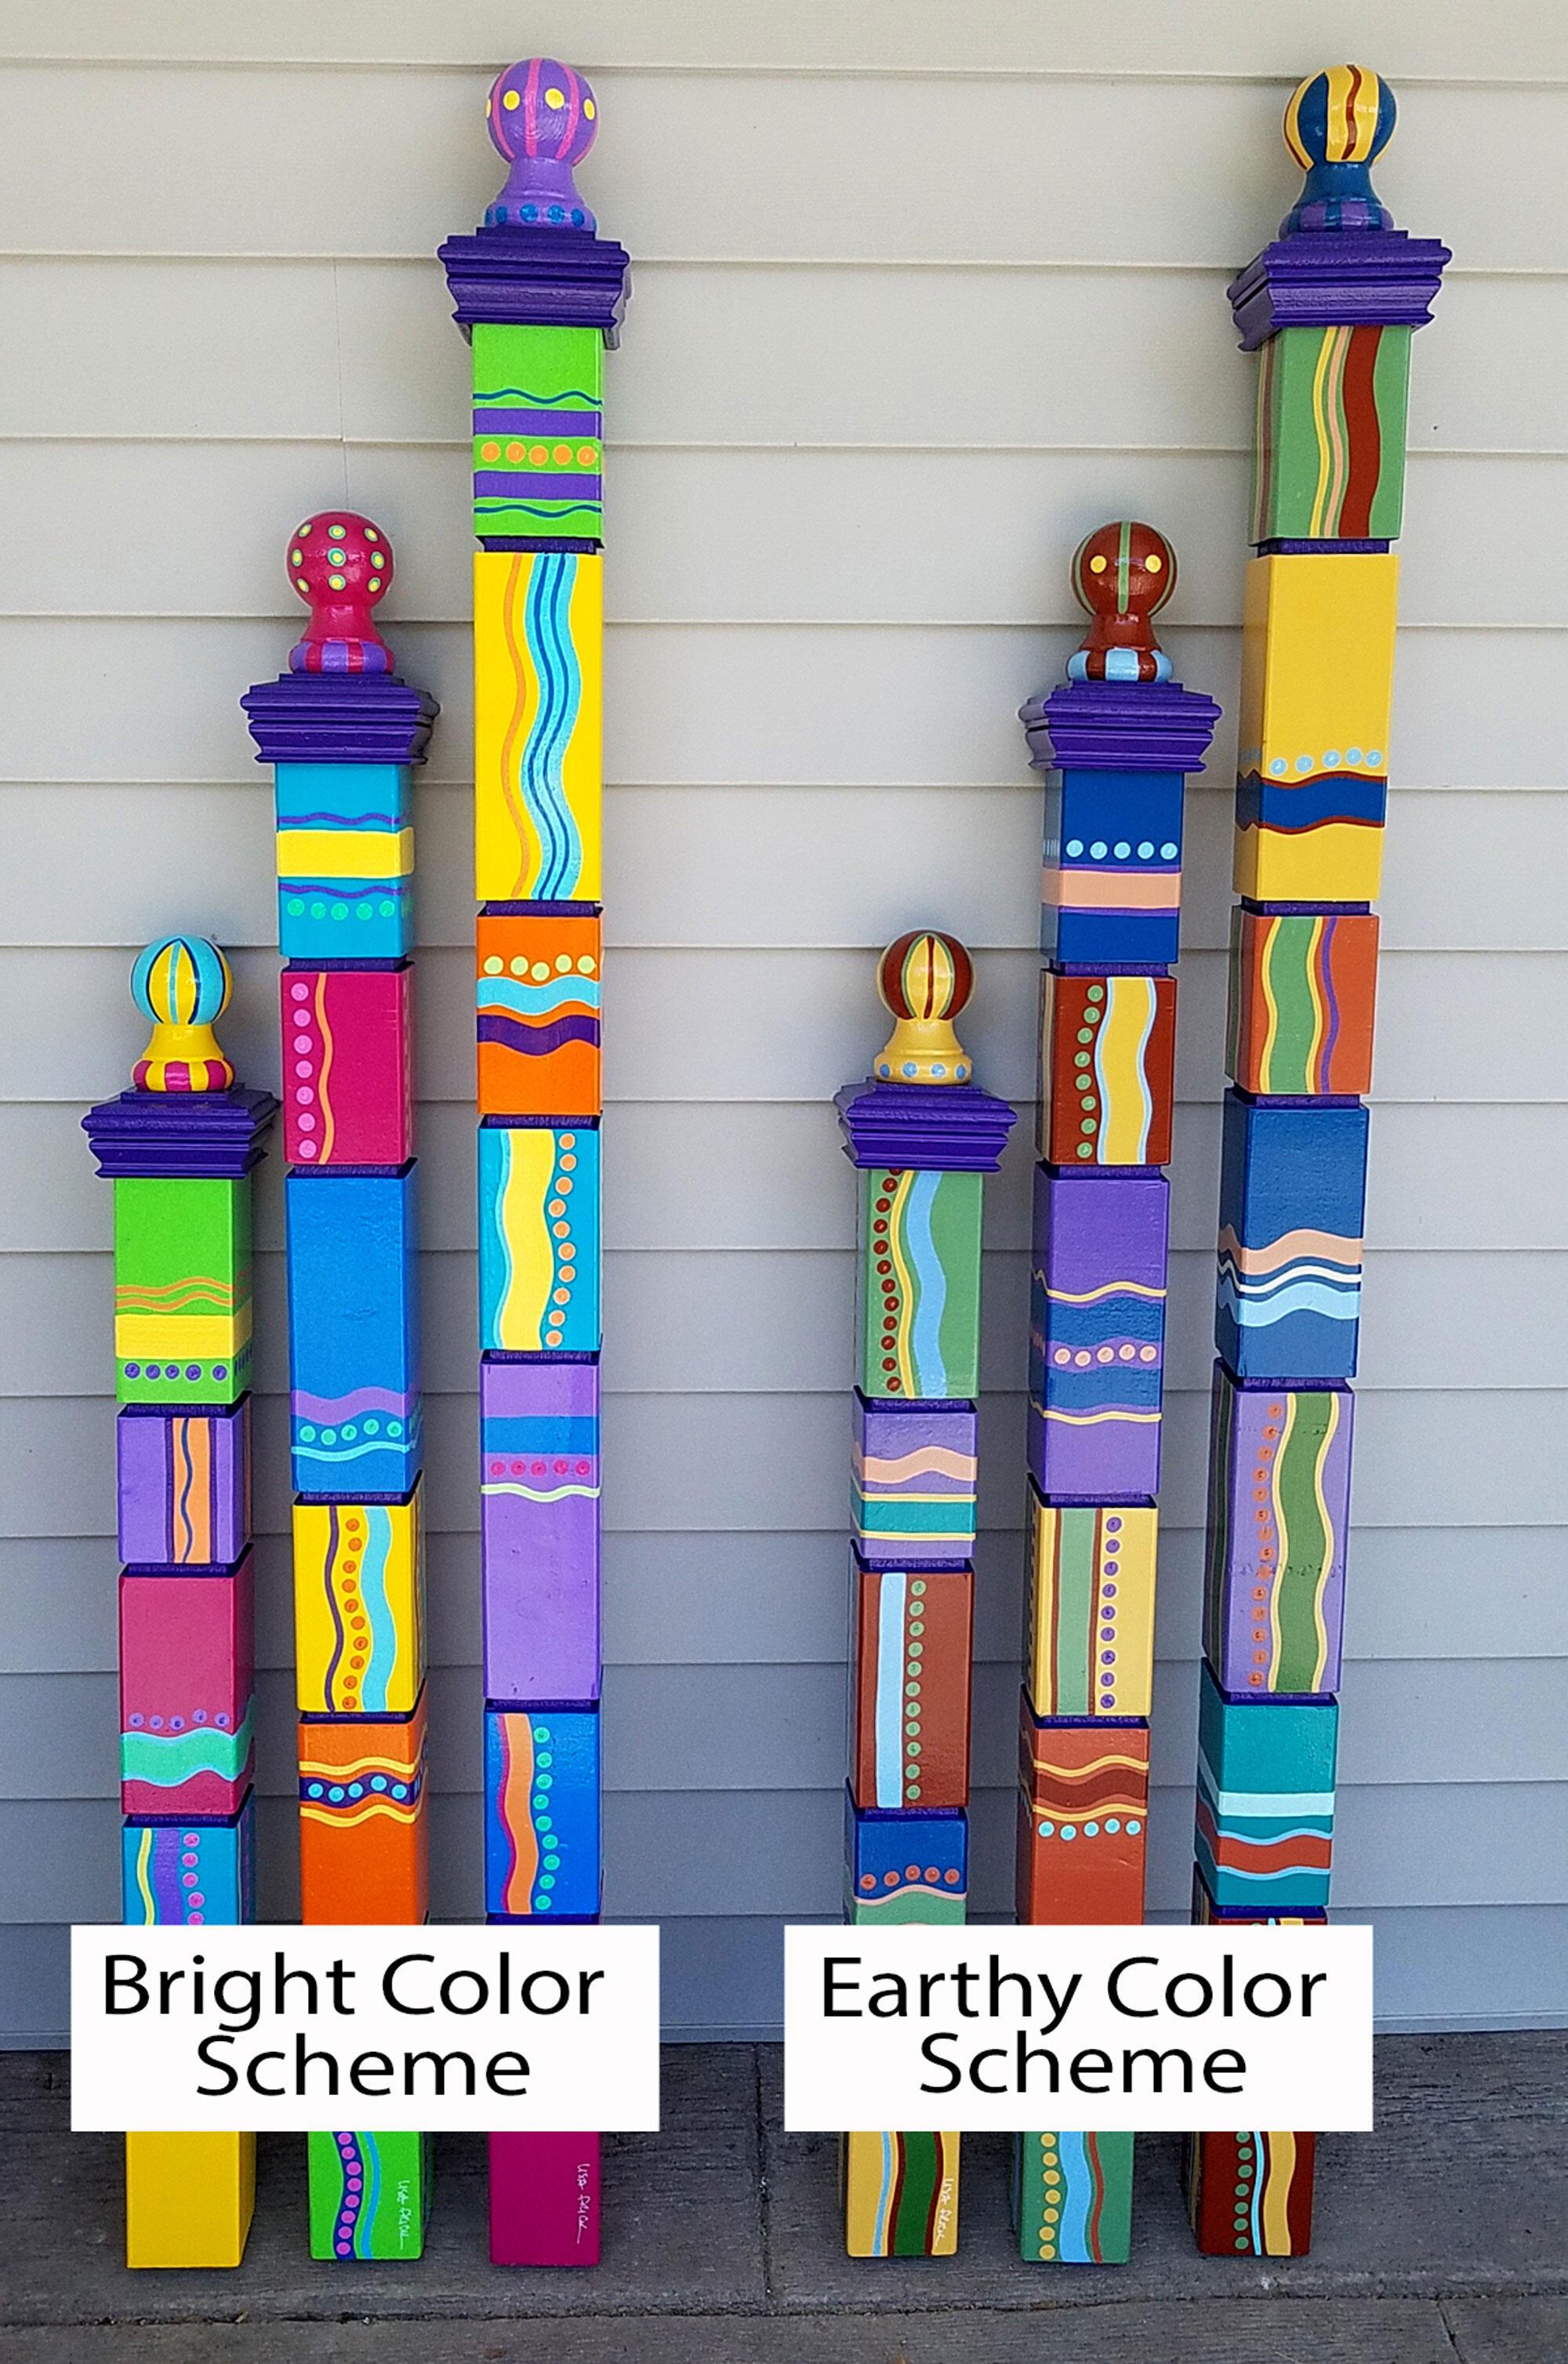 Home Living Home Decor Garden Totems Preorder Totem Pole Garden Pole Hand Painted Garden Art Garden Sculpture Sculptural Totems Yard Art Colorful Totems Lawn Art Pyramid Top